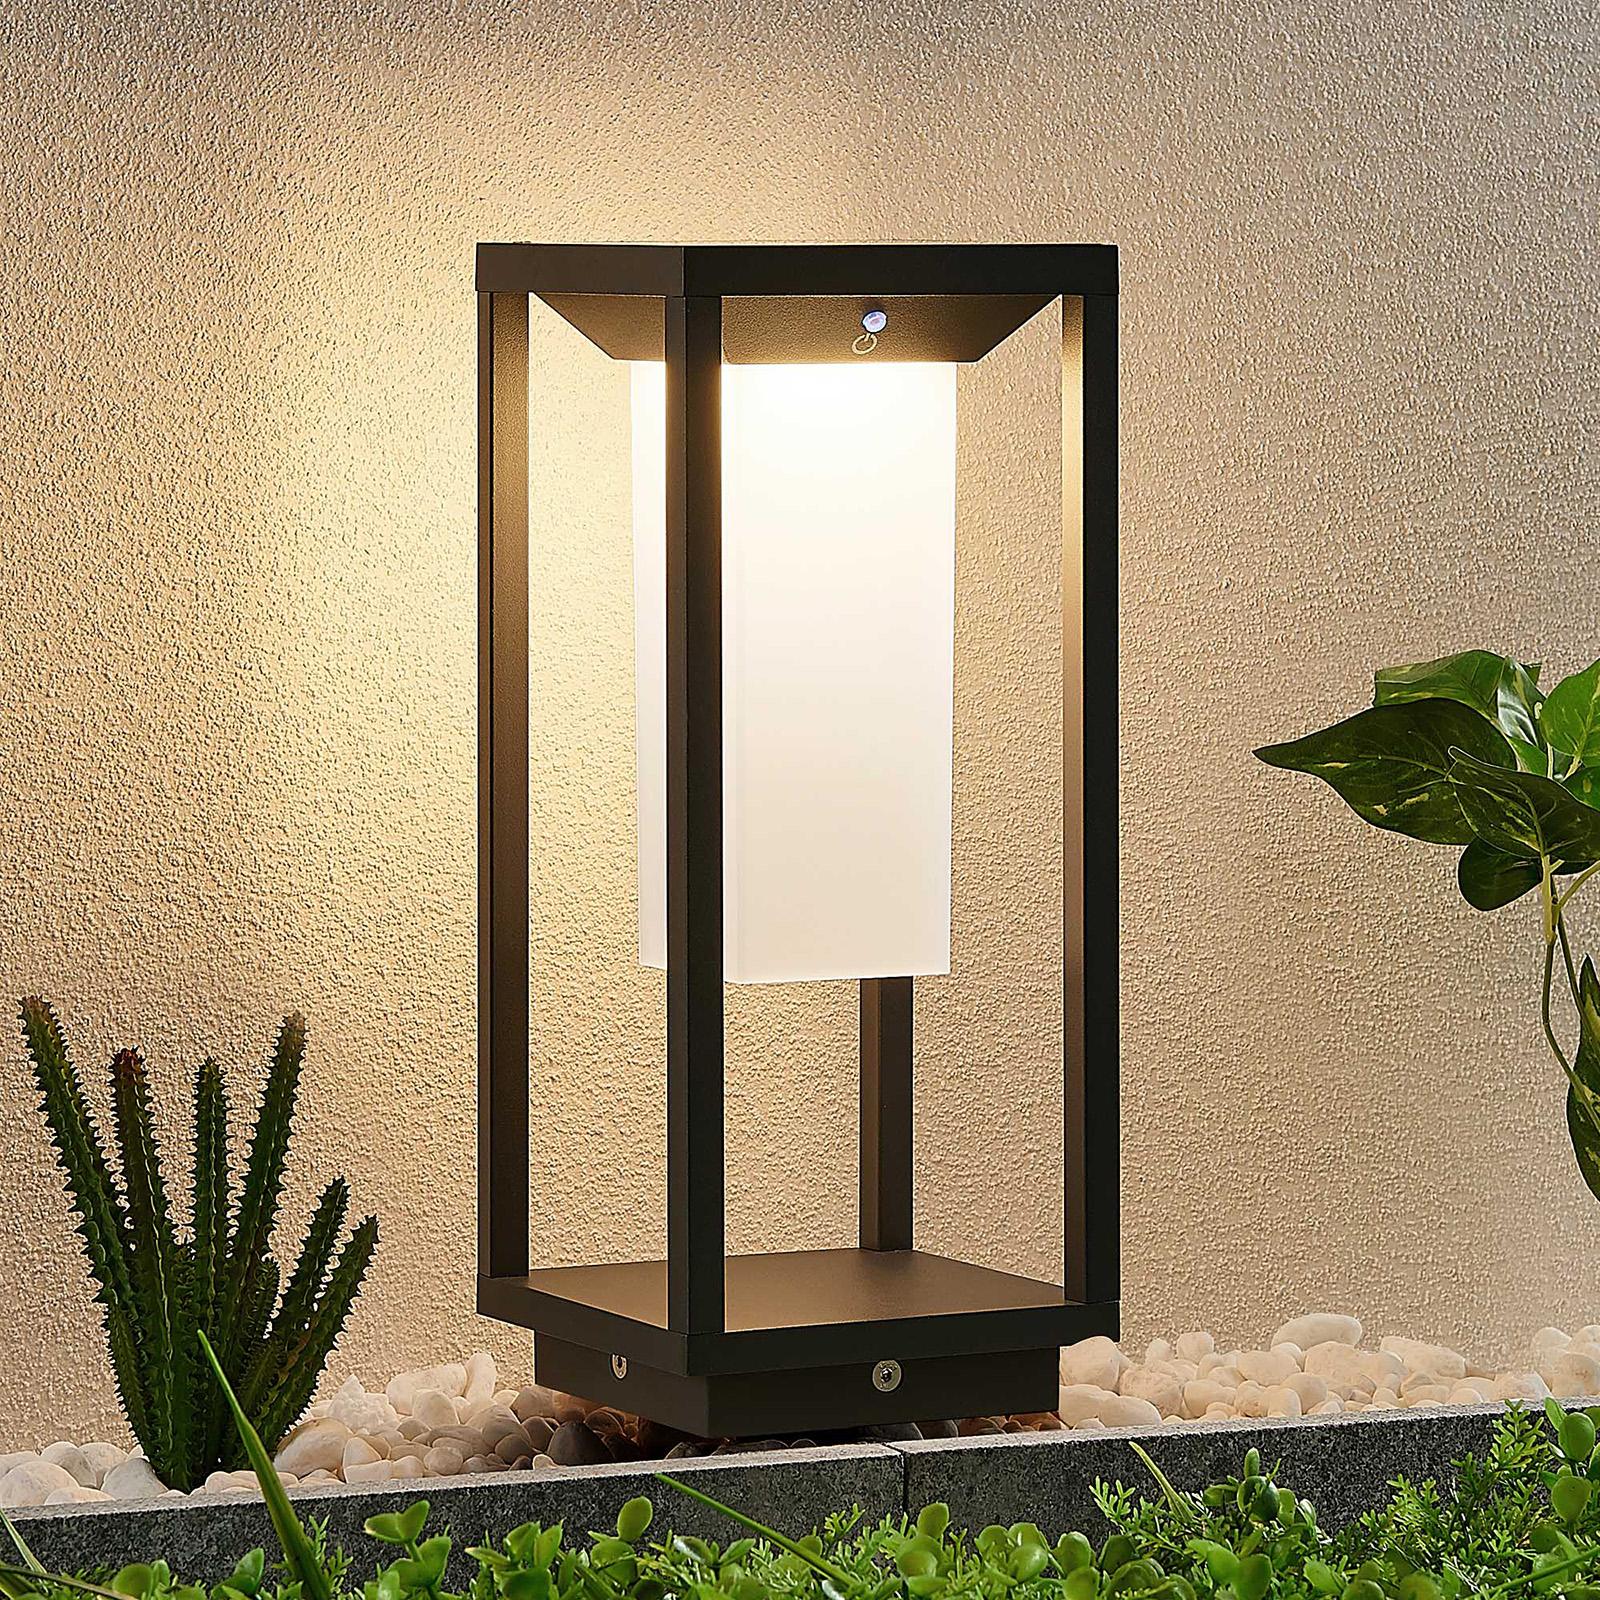 Lucande Eliel solarna lampa cokołowa LED, 34 cm